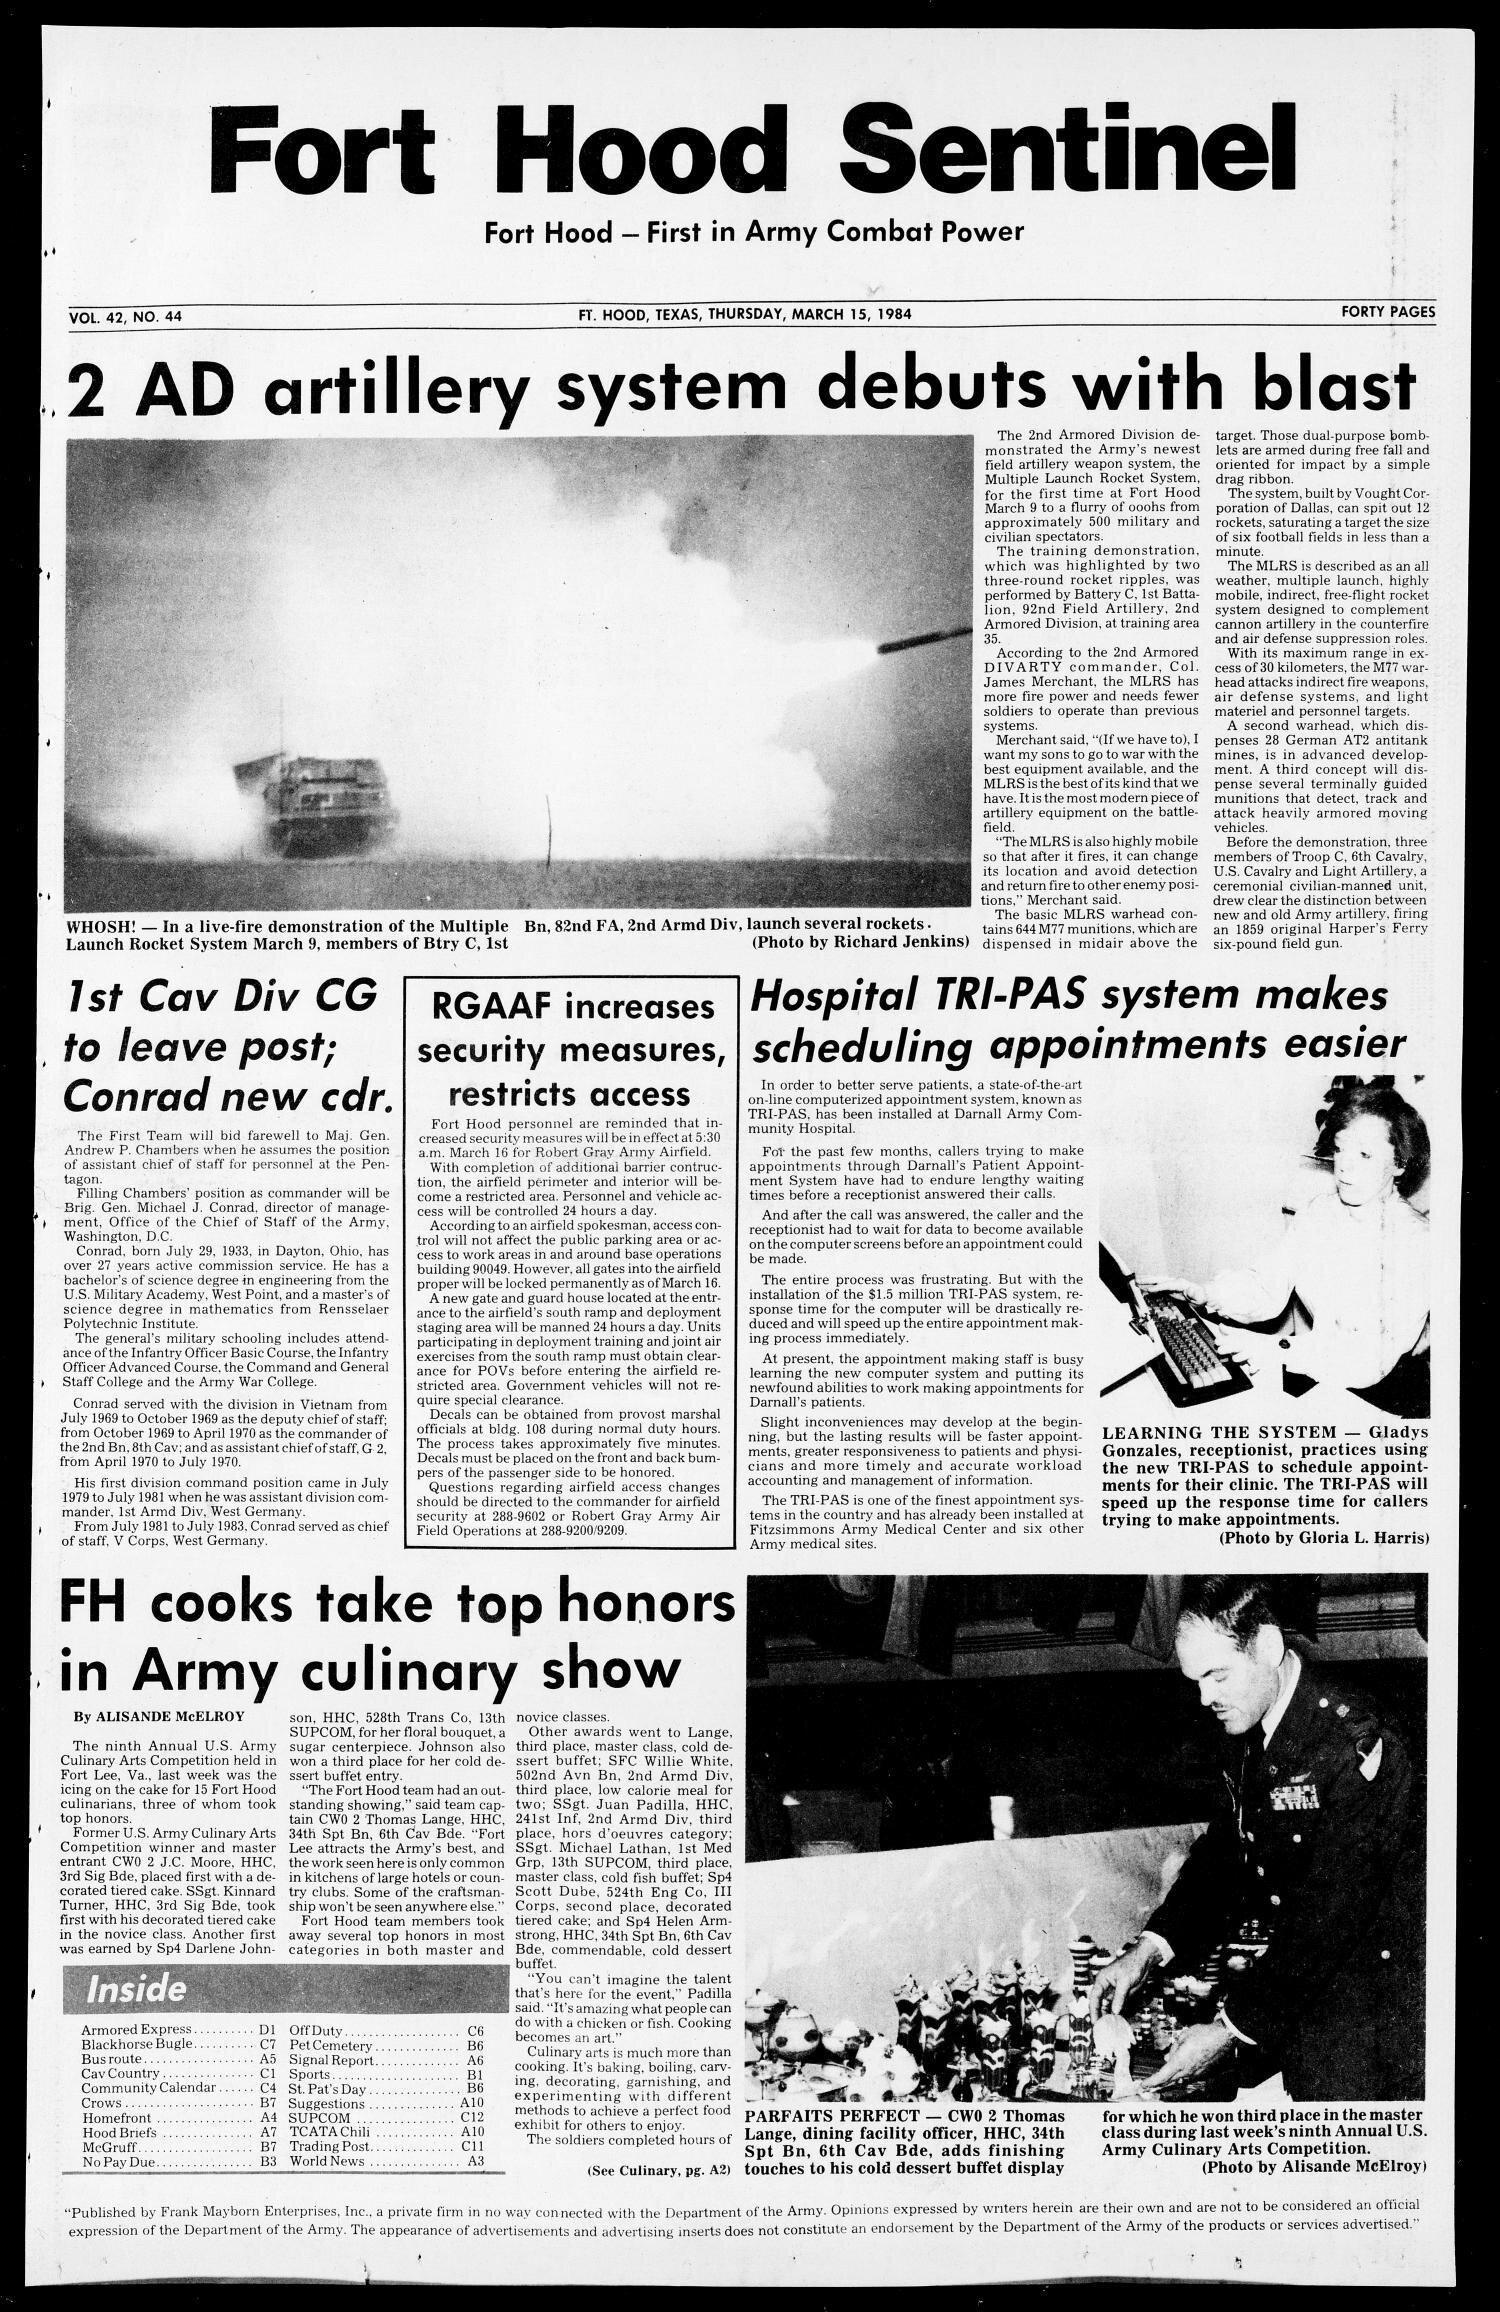 FT. HOOD SENTINEL_15 MAR 1984.jpg